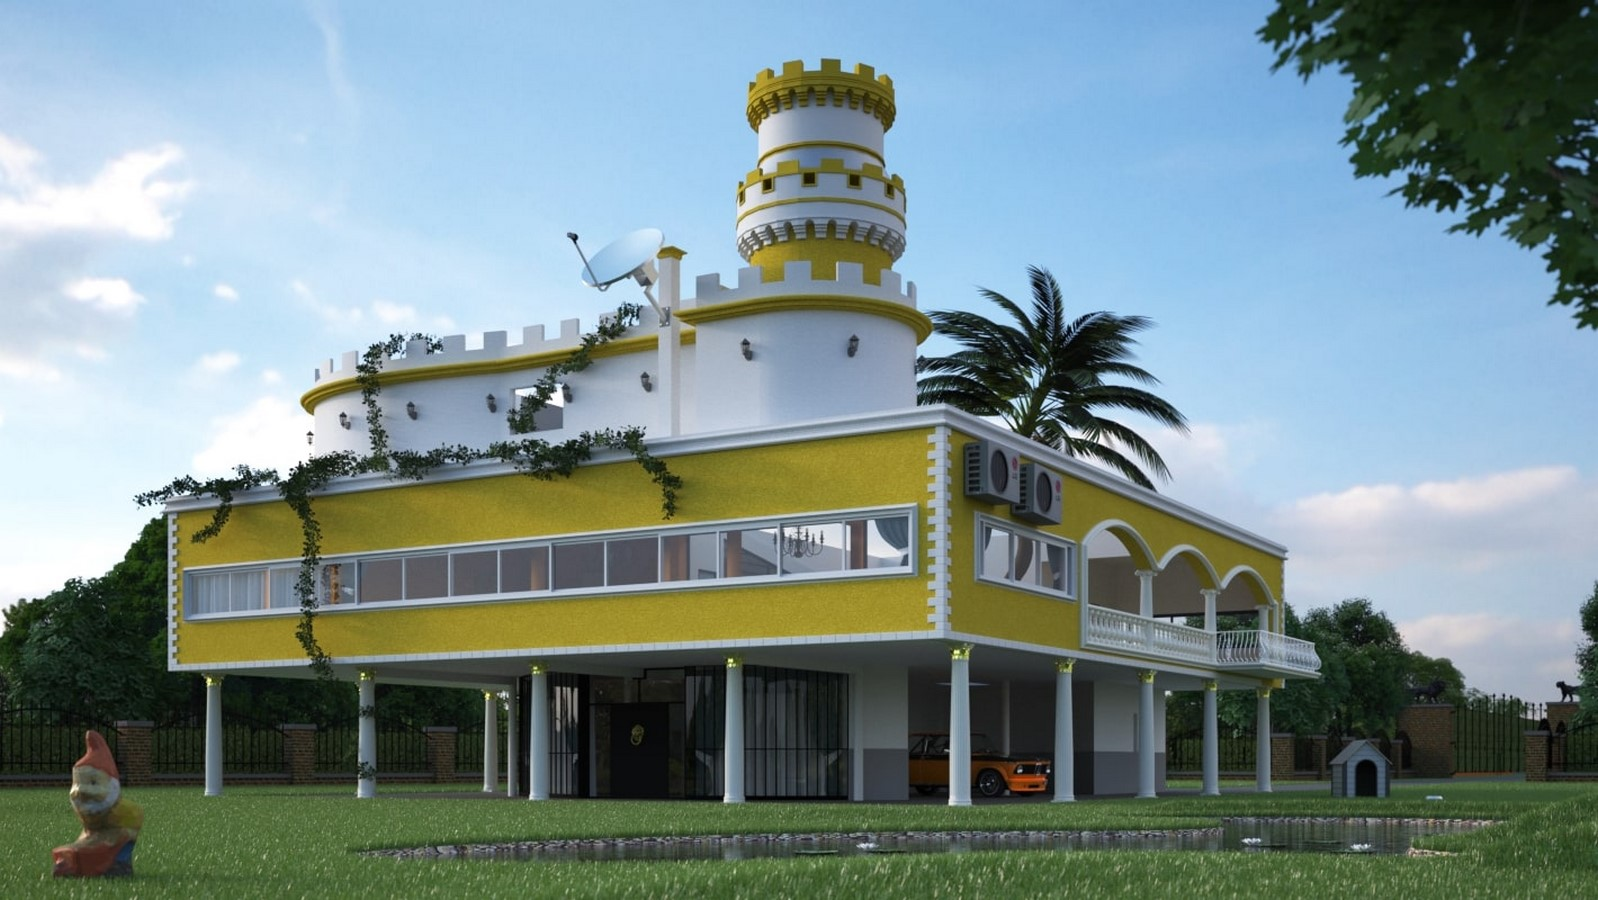 Kitsch Architecture: Developed by industrialization and urbanization Sheet1